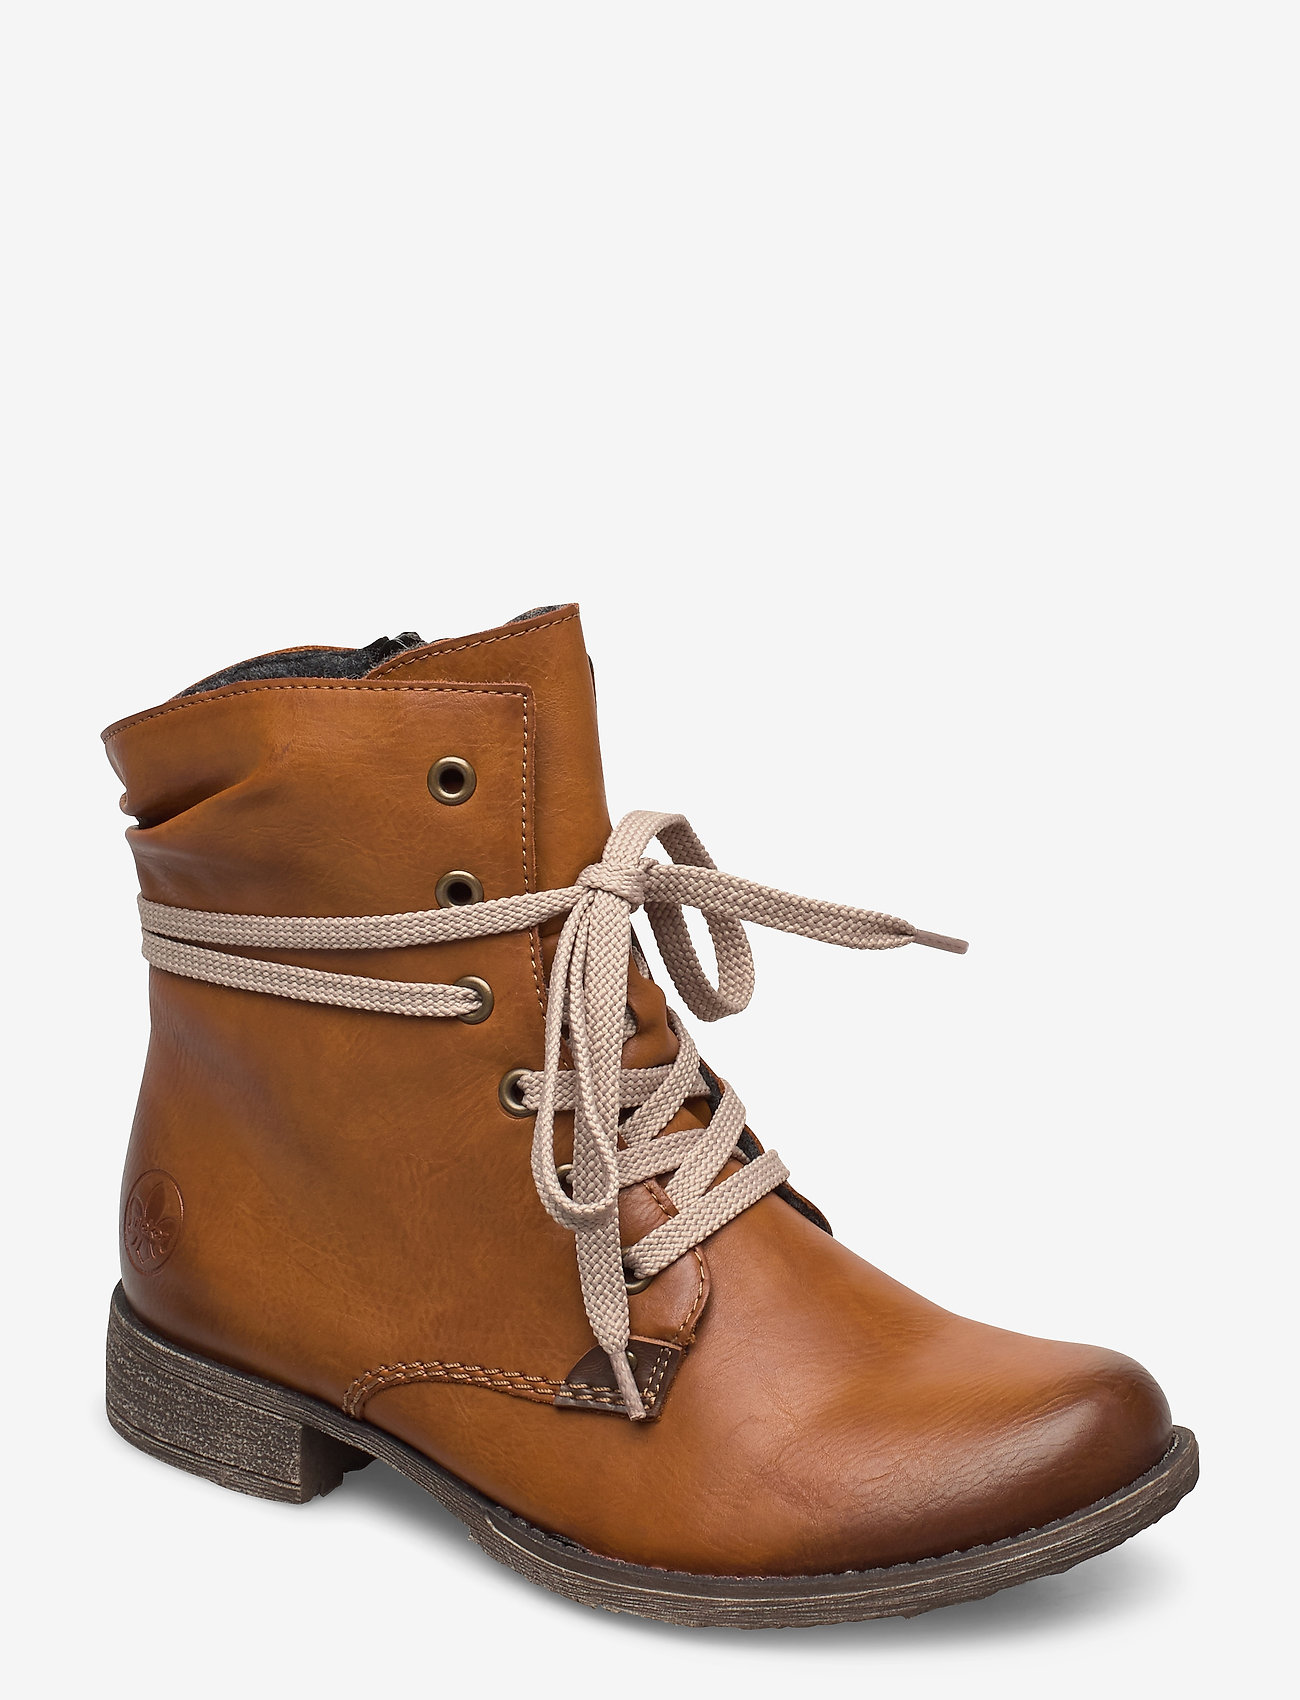 Rieker - 70829-24 - wysoki obcas - brown - 0